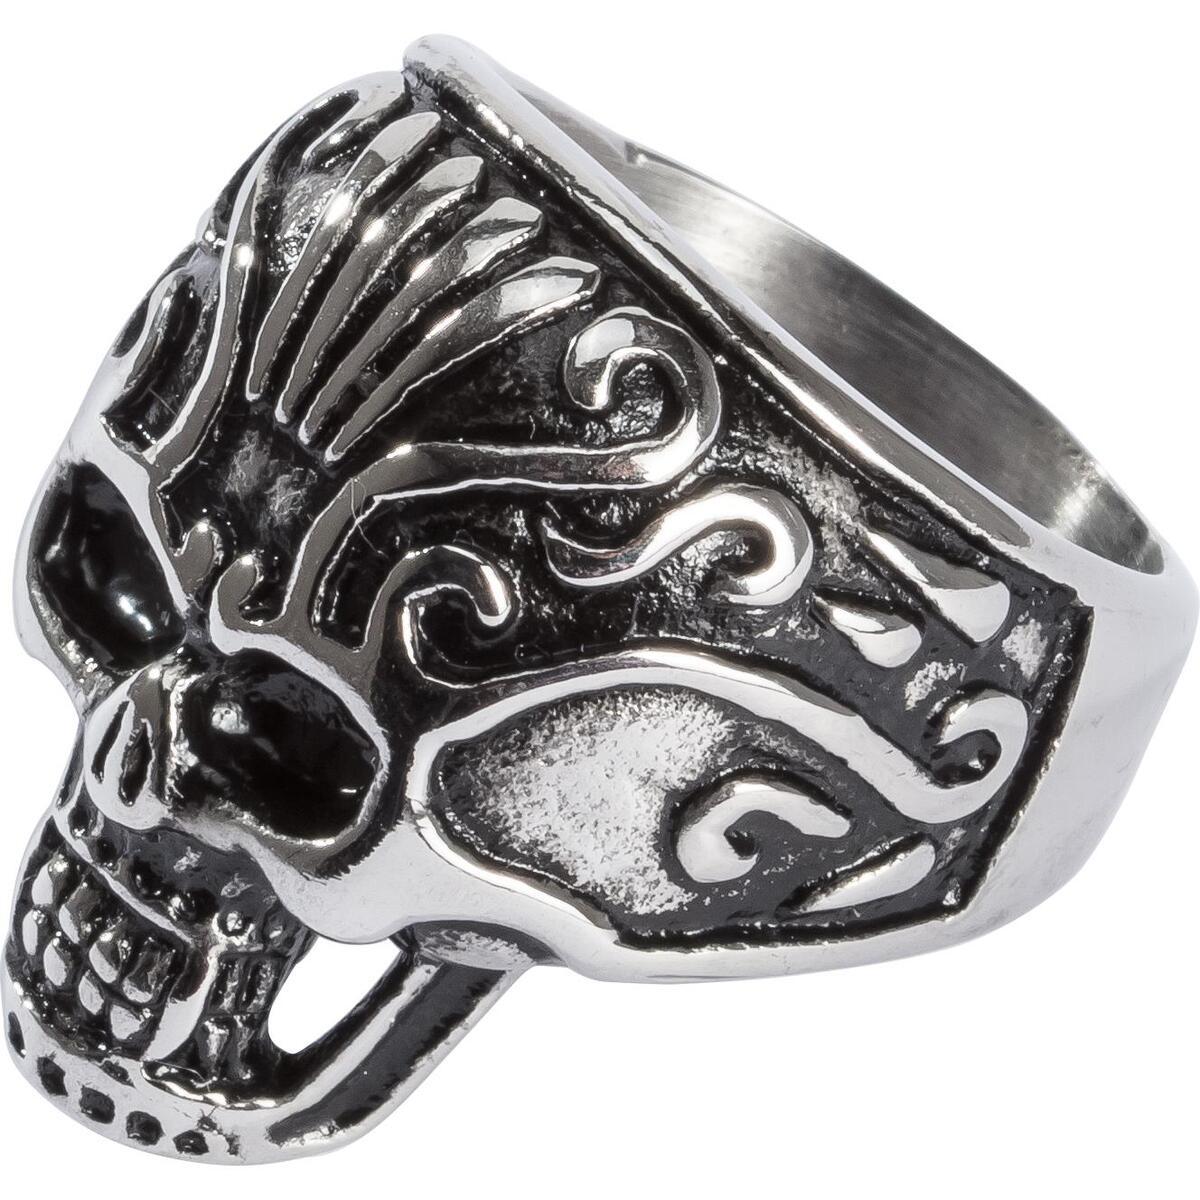 Bild 2 von Spirit Motors Edelstahl Ring mit Totenkopf 2.0